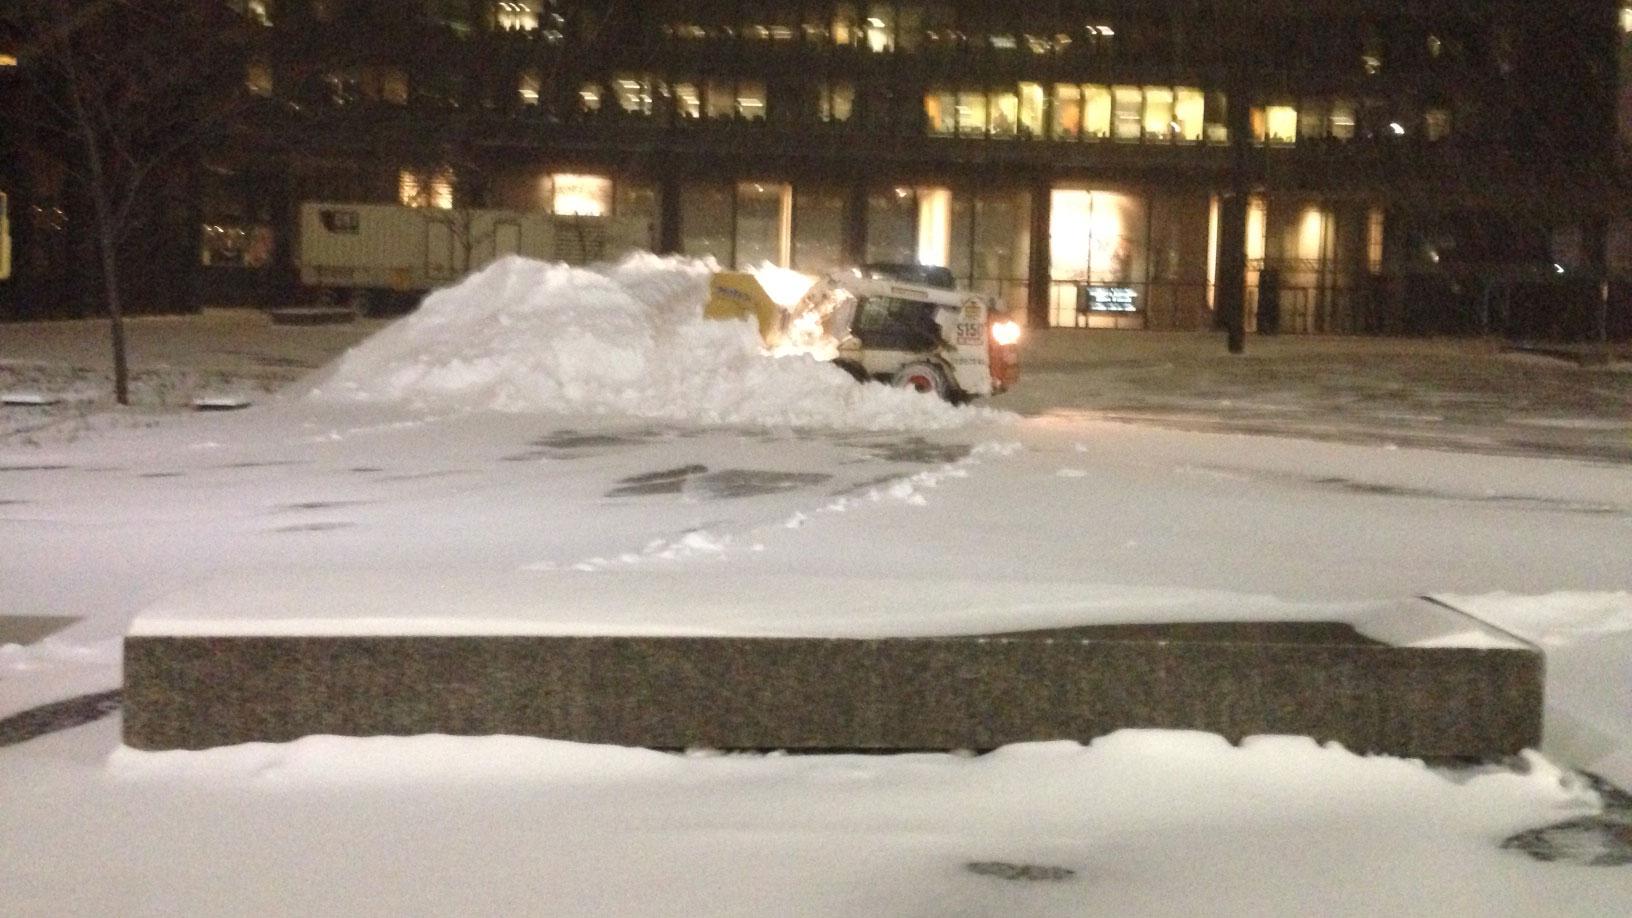 Snow clearing crews on a Toronto street on April 4, 2016.  CITYNEWS/Bertram Dandy.